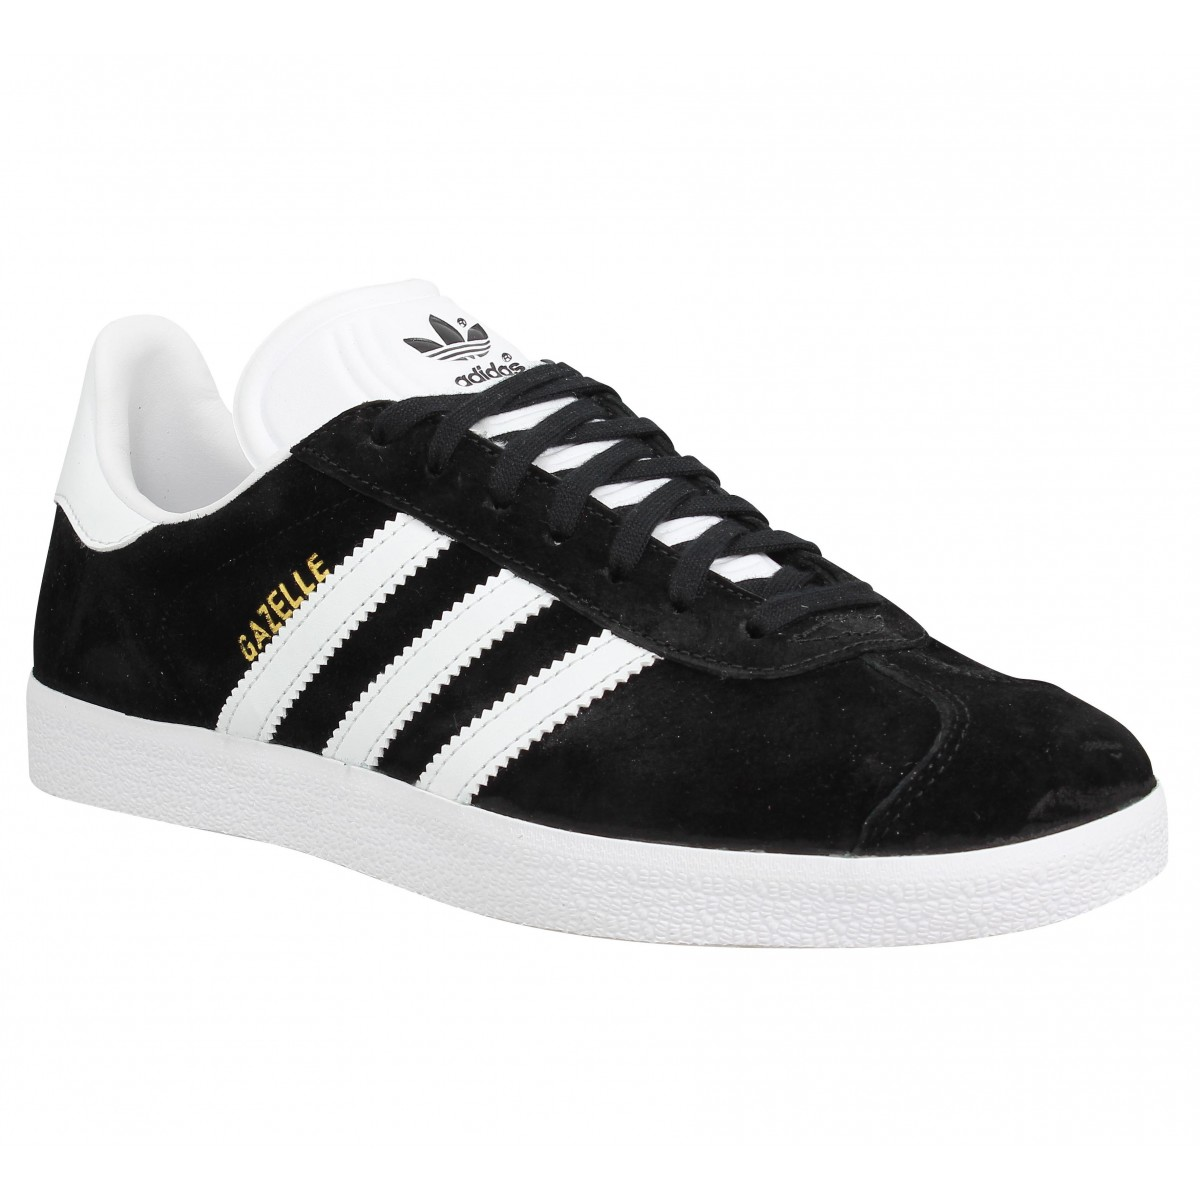 Adidas Gazelle Noir Femme Fanny Chaussures